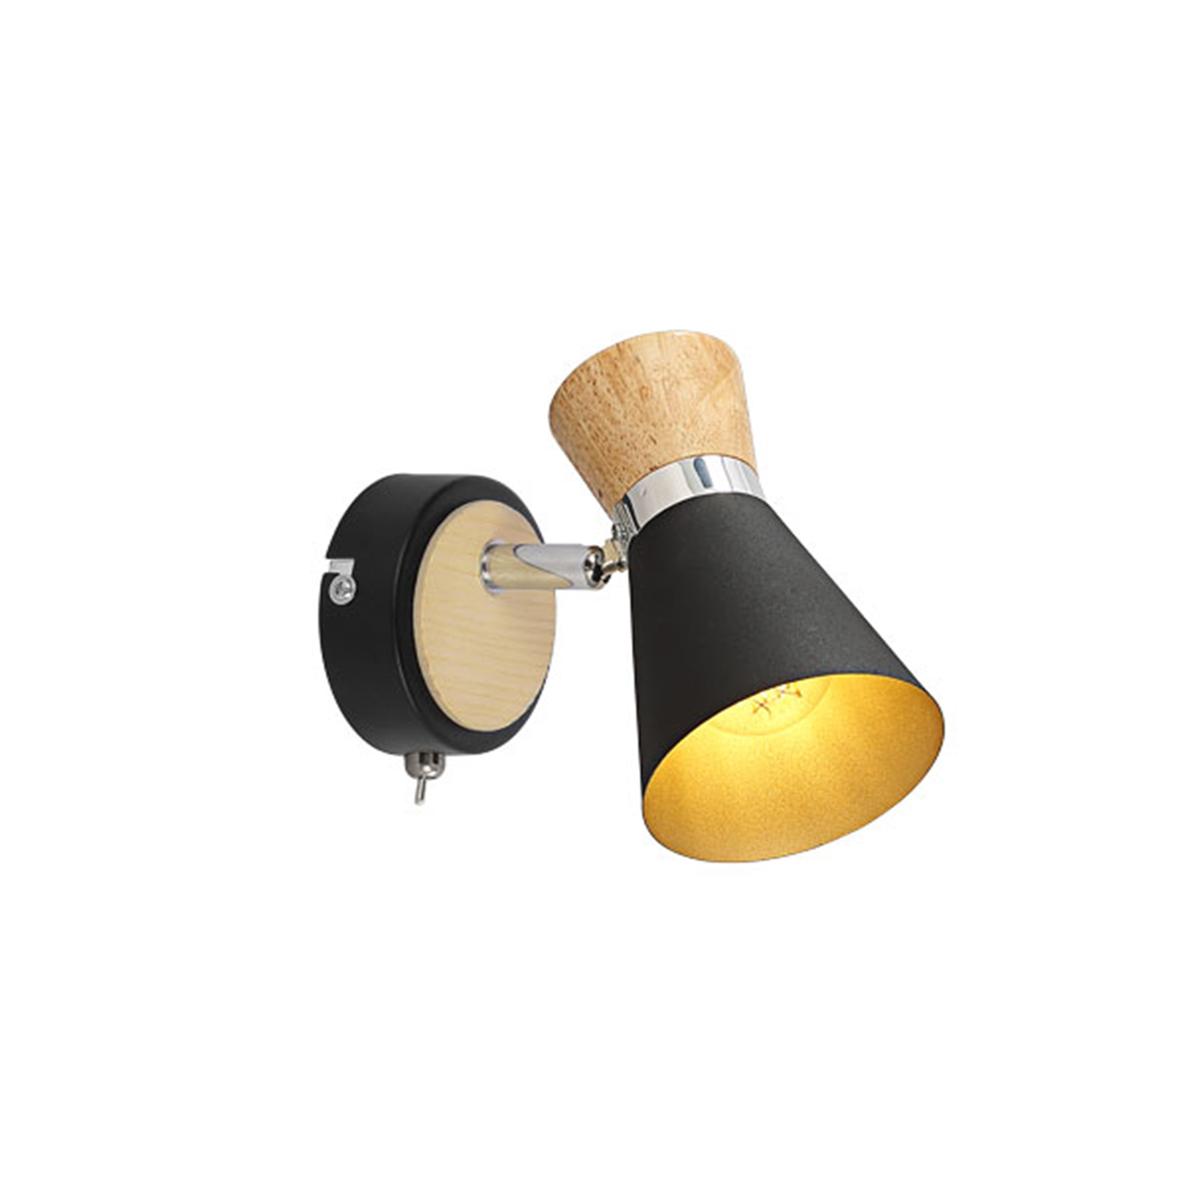 Spot lampa Naxos/1 6600836